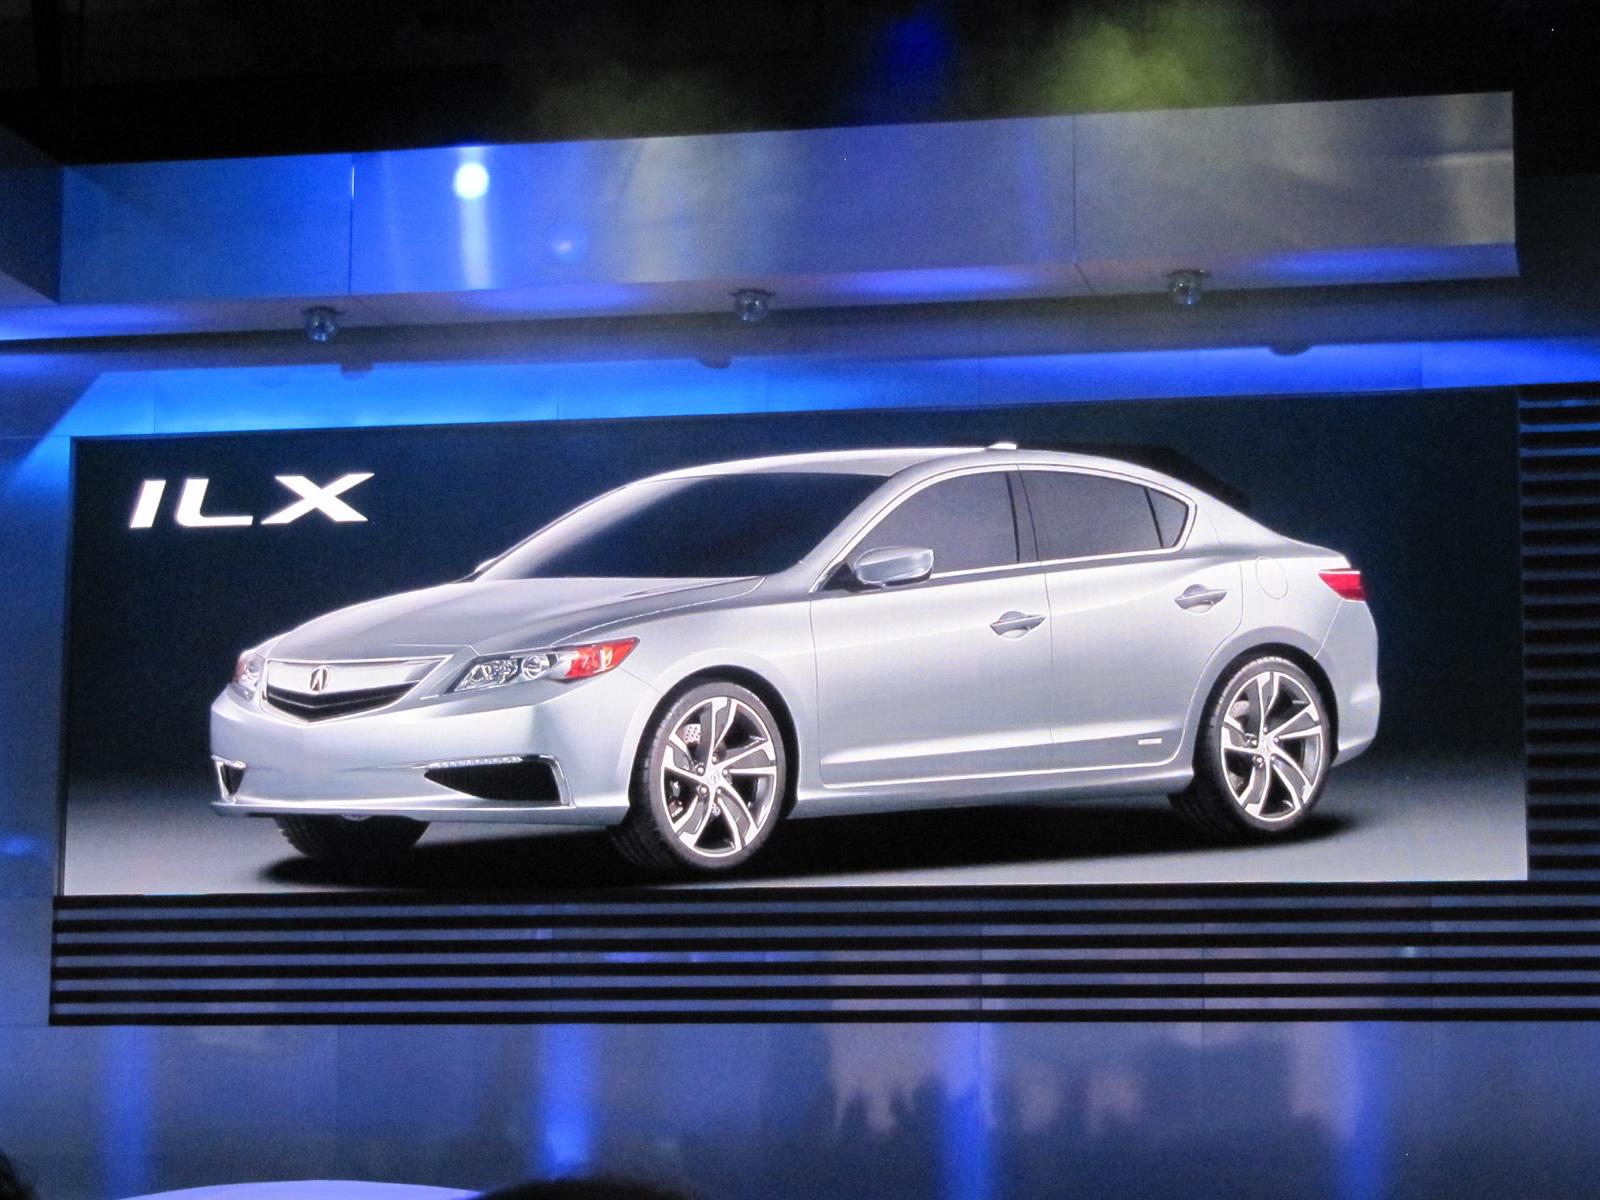 2013 Acura ILX Live Photos: 2012 Detroit Auto Show